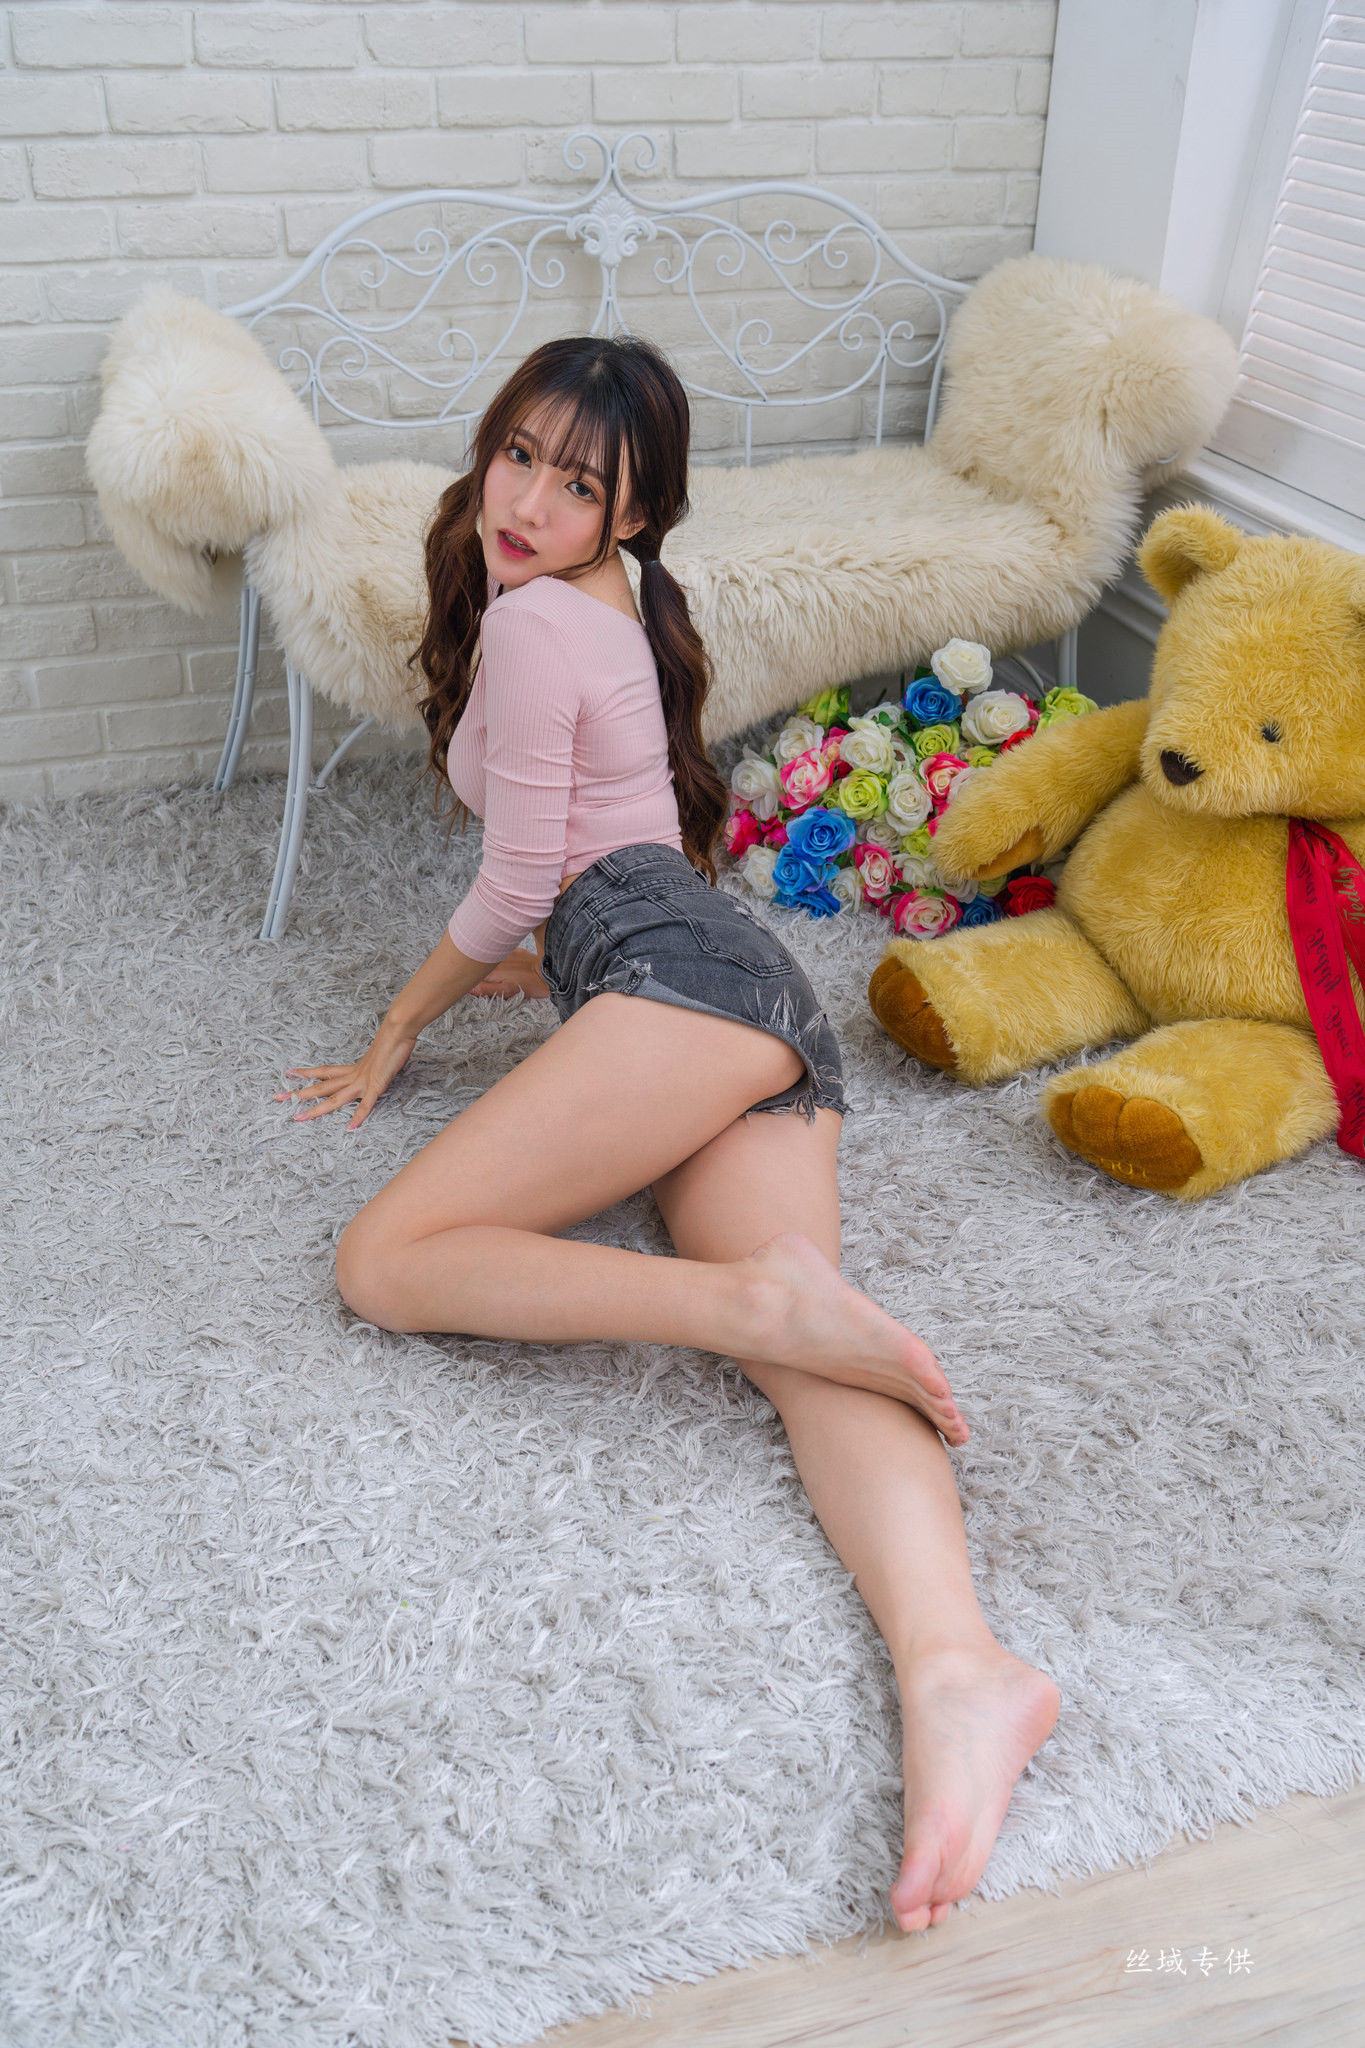 VOL.1545 [台湾正妹]美腿妹子嫩模:比比儿(Katie Chiu)超高清个人性感漂亮大图(79P)